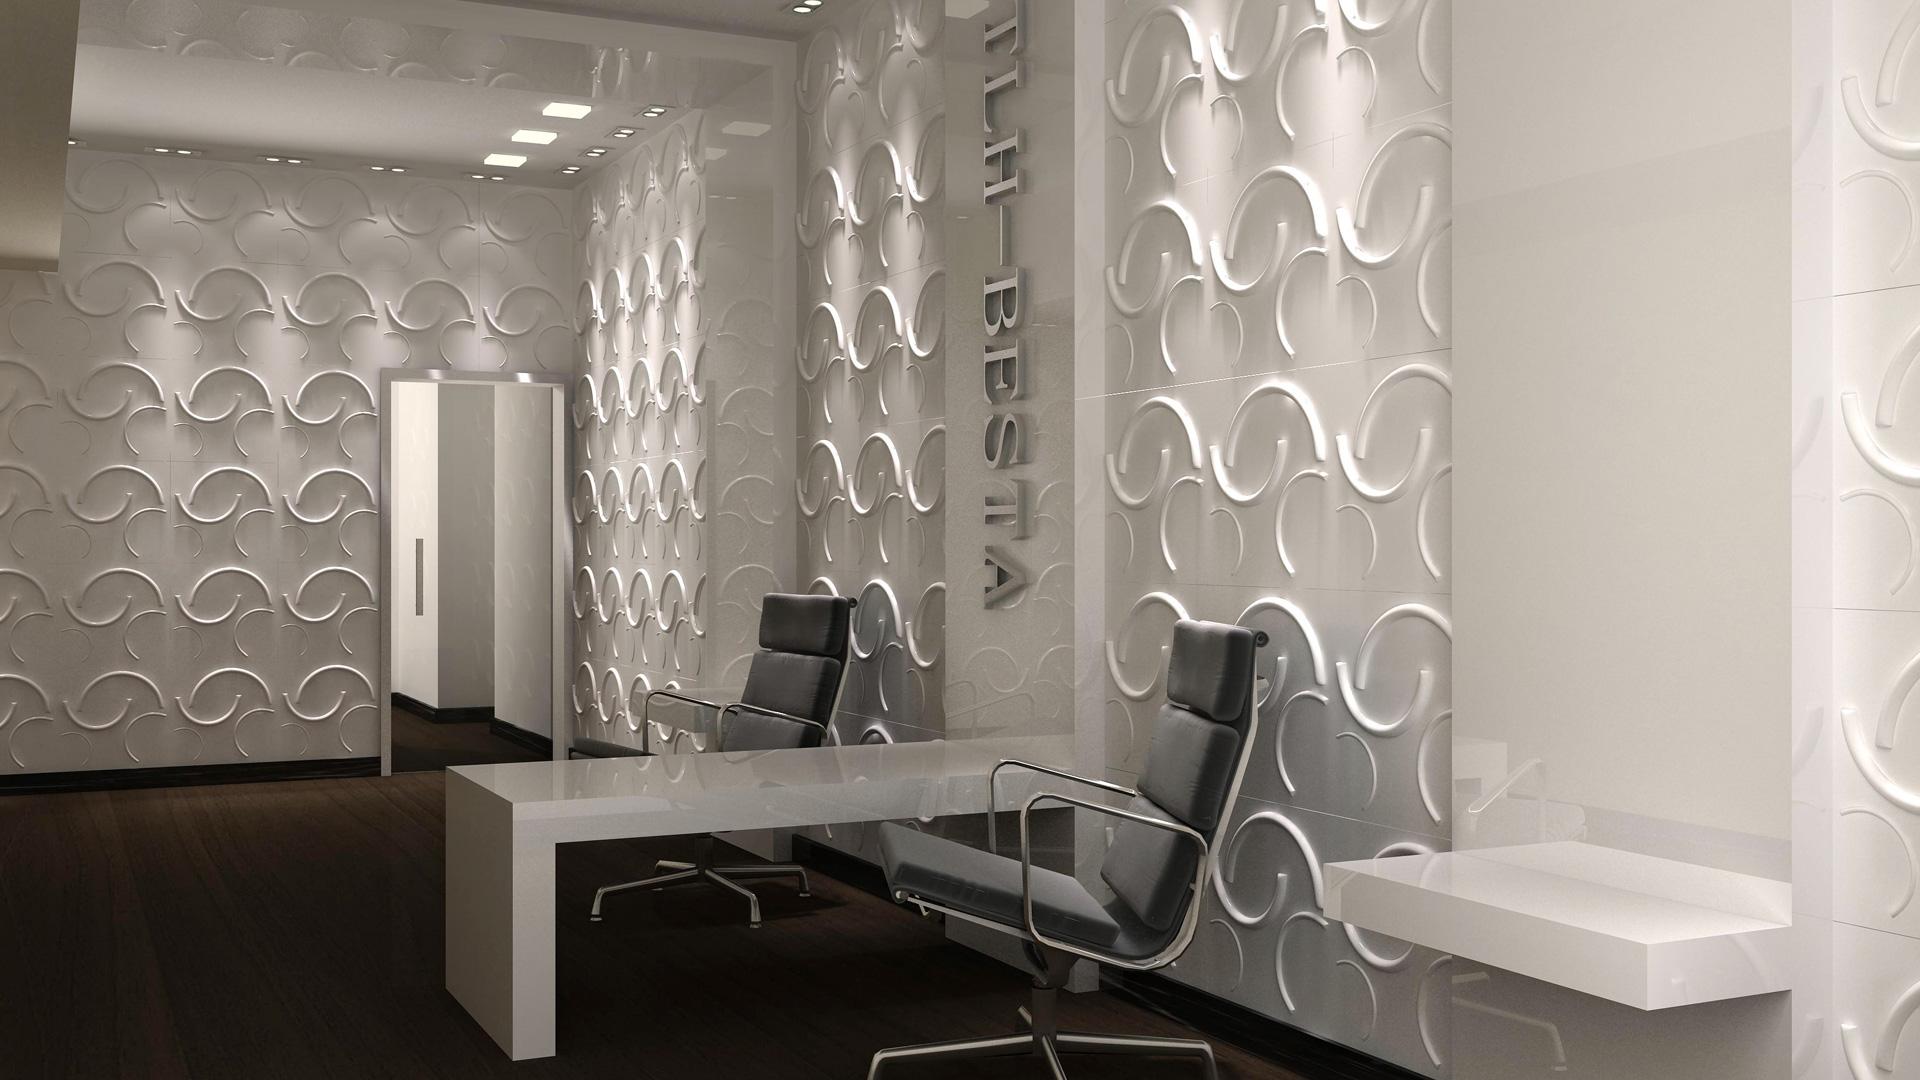 3D Wandpaneele - Produkte - Besta - Deckenpaneele - 3D Tapeten - Wandverkleidung